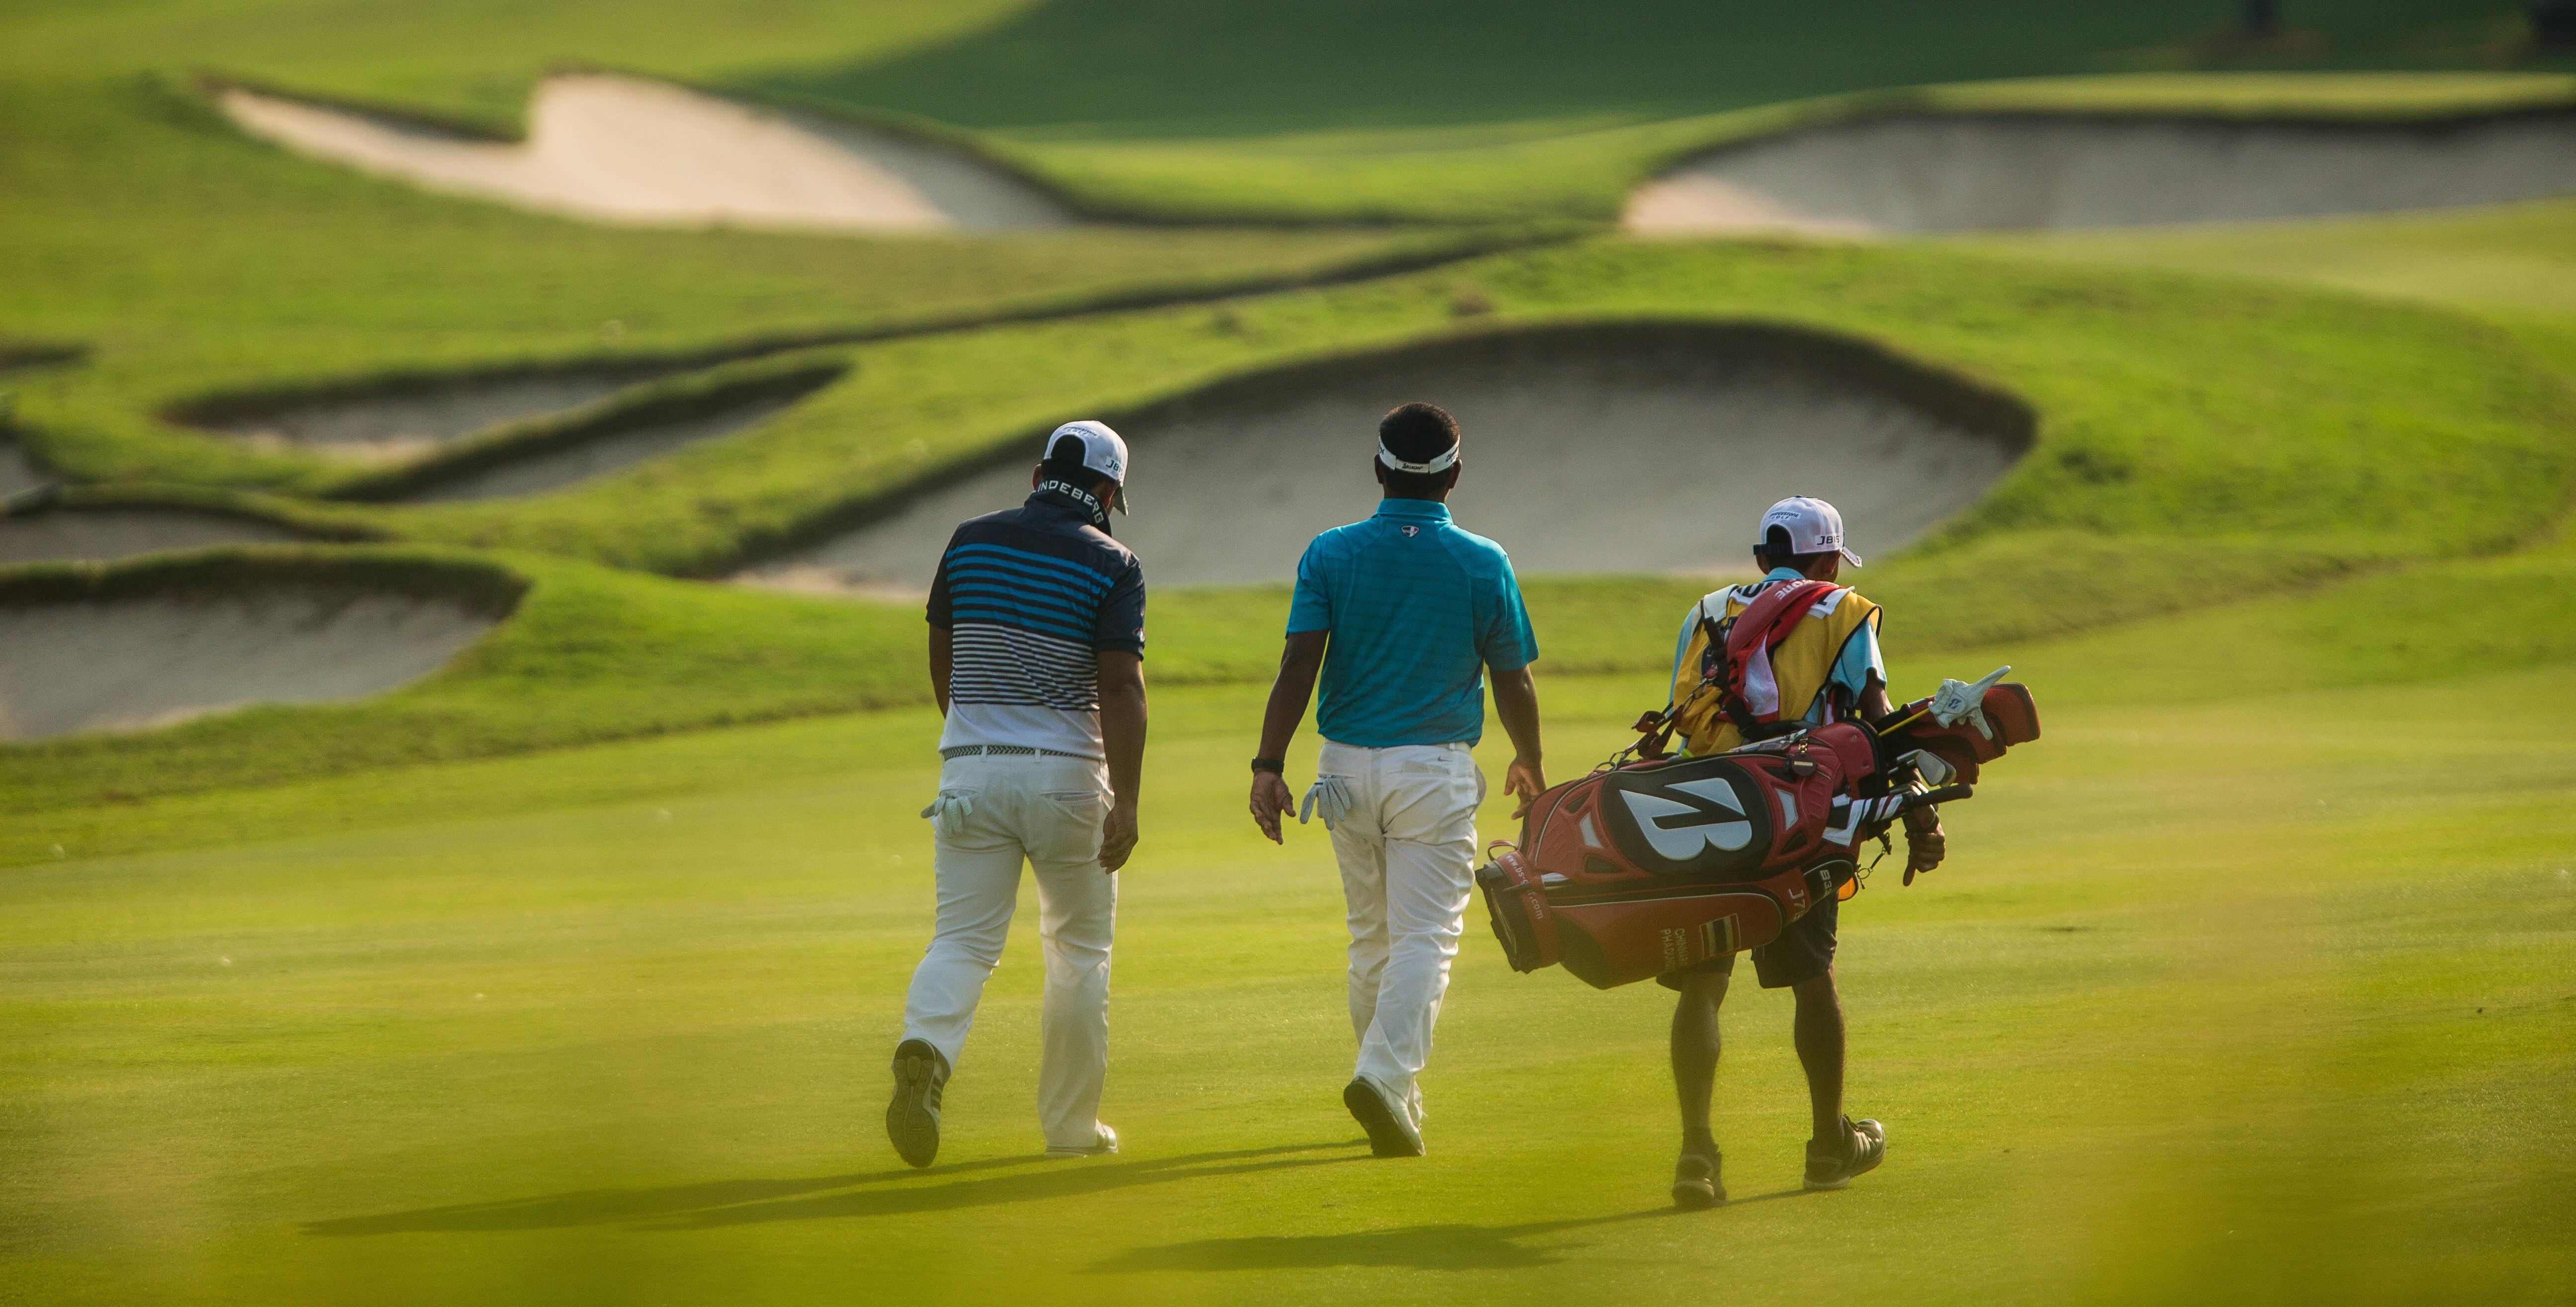 thailand golf championship